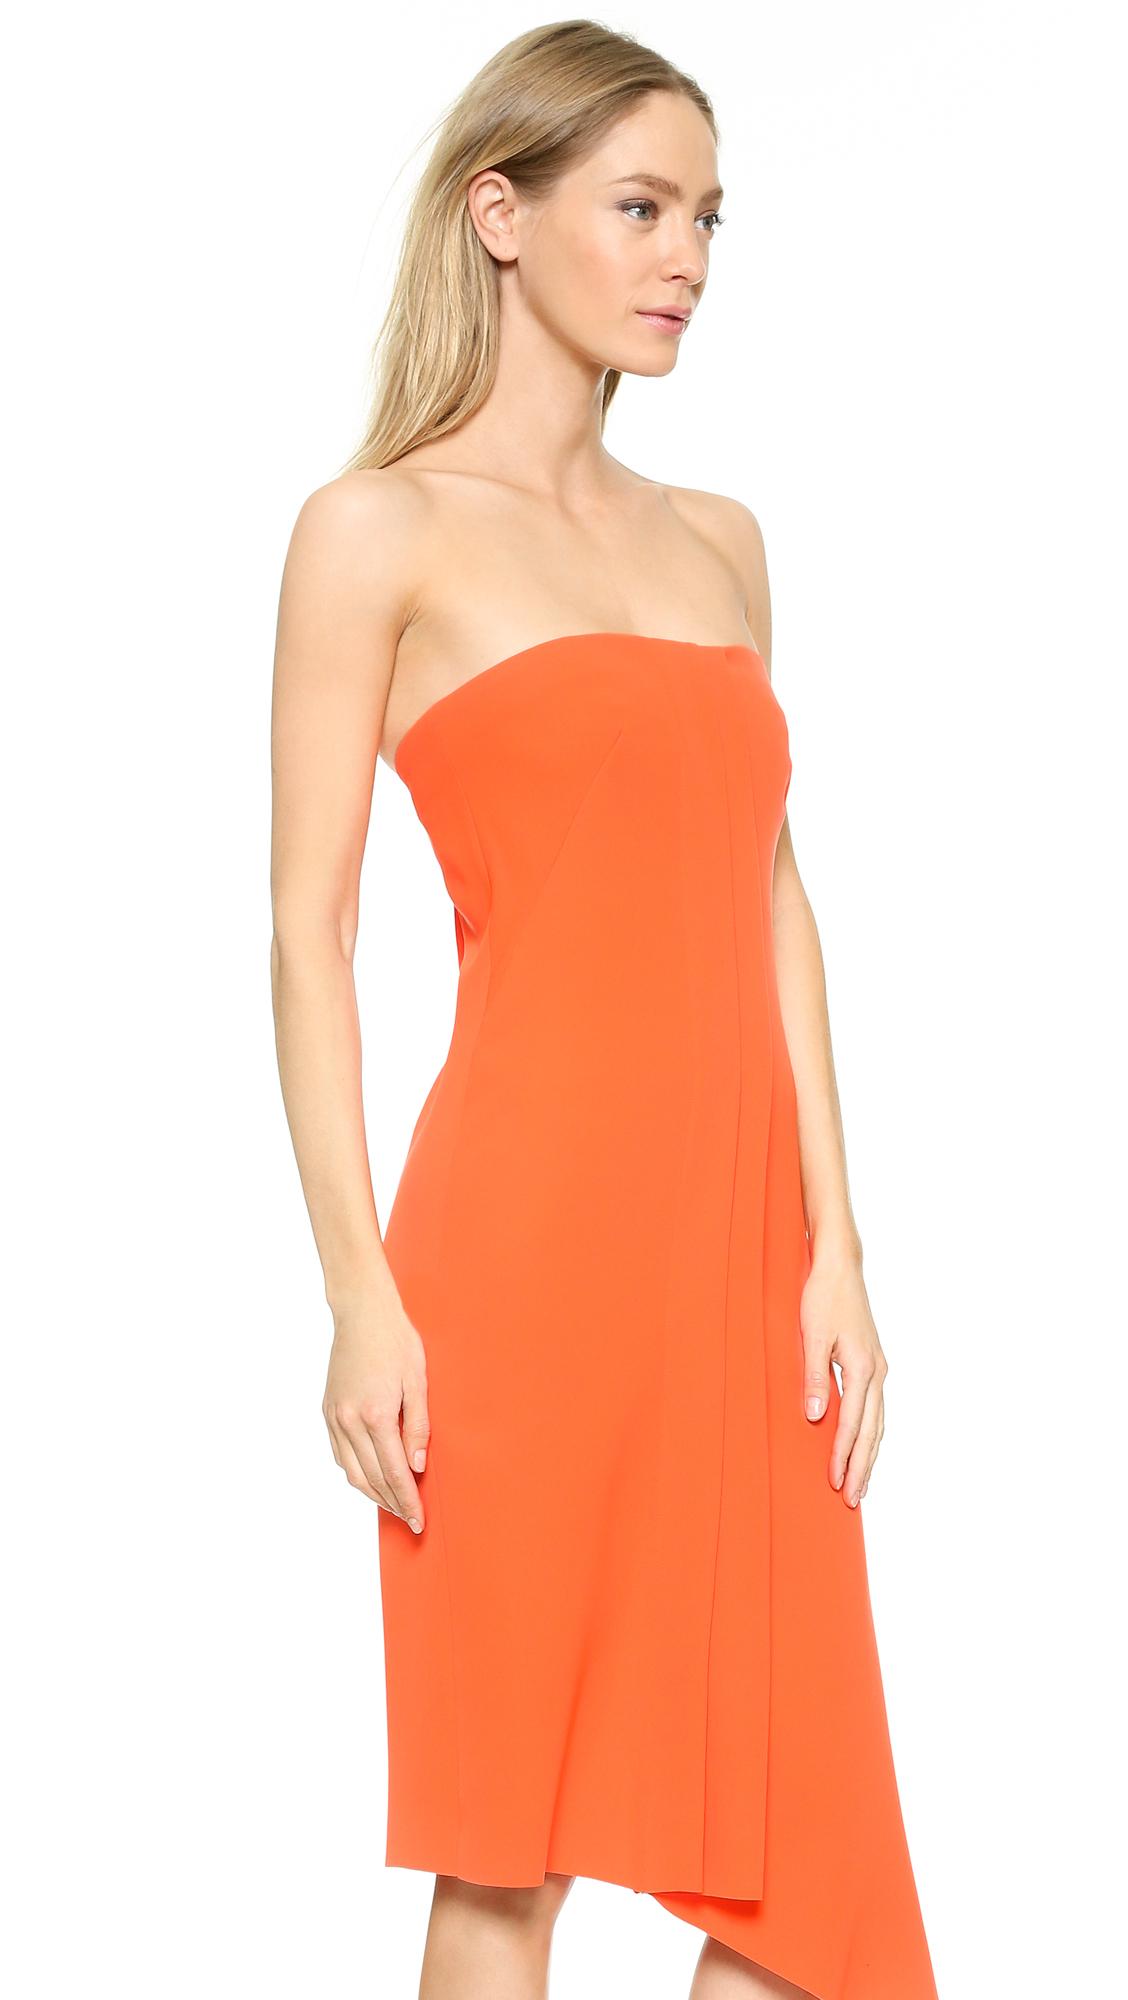 Cedric charlier Strapless Dress in Orange | Lyst